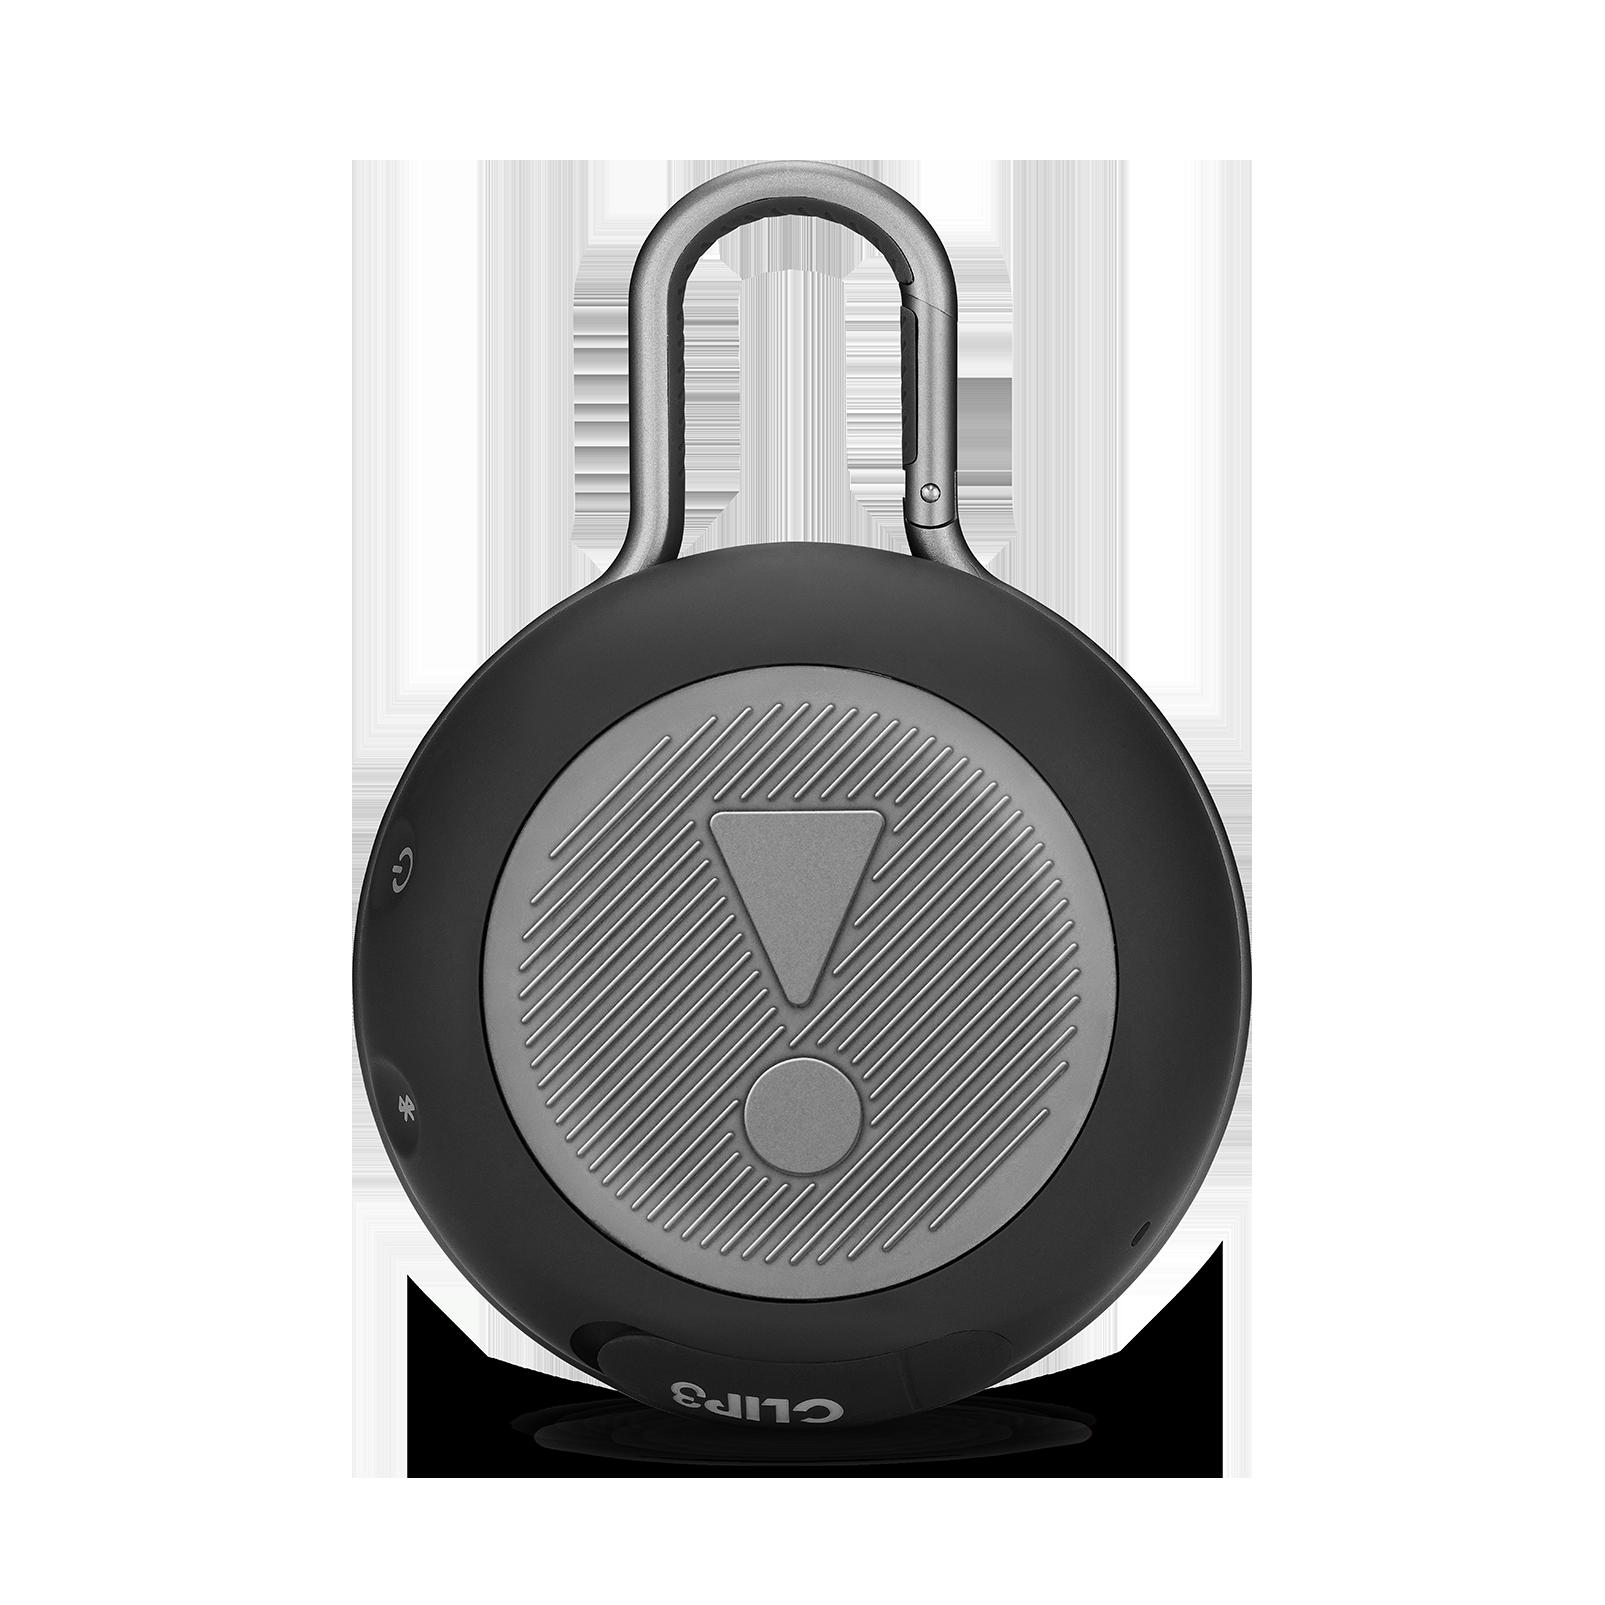 JBL CLIP 3 - Black/White Camouflage - Portable Bluetooth® speaker - Back